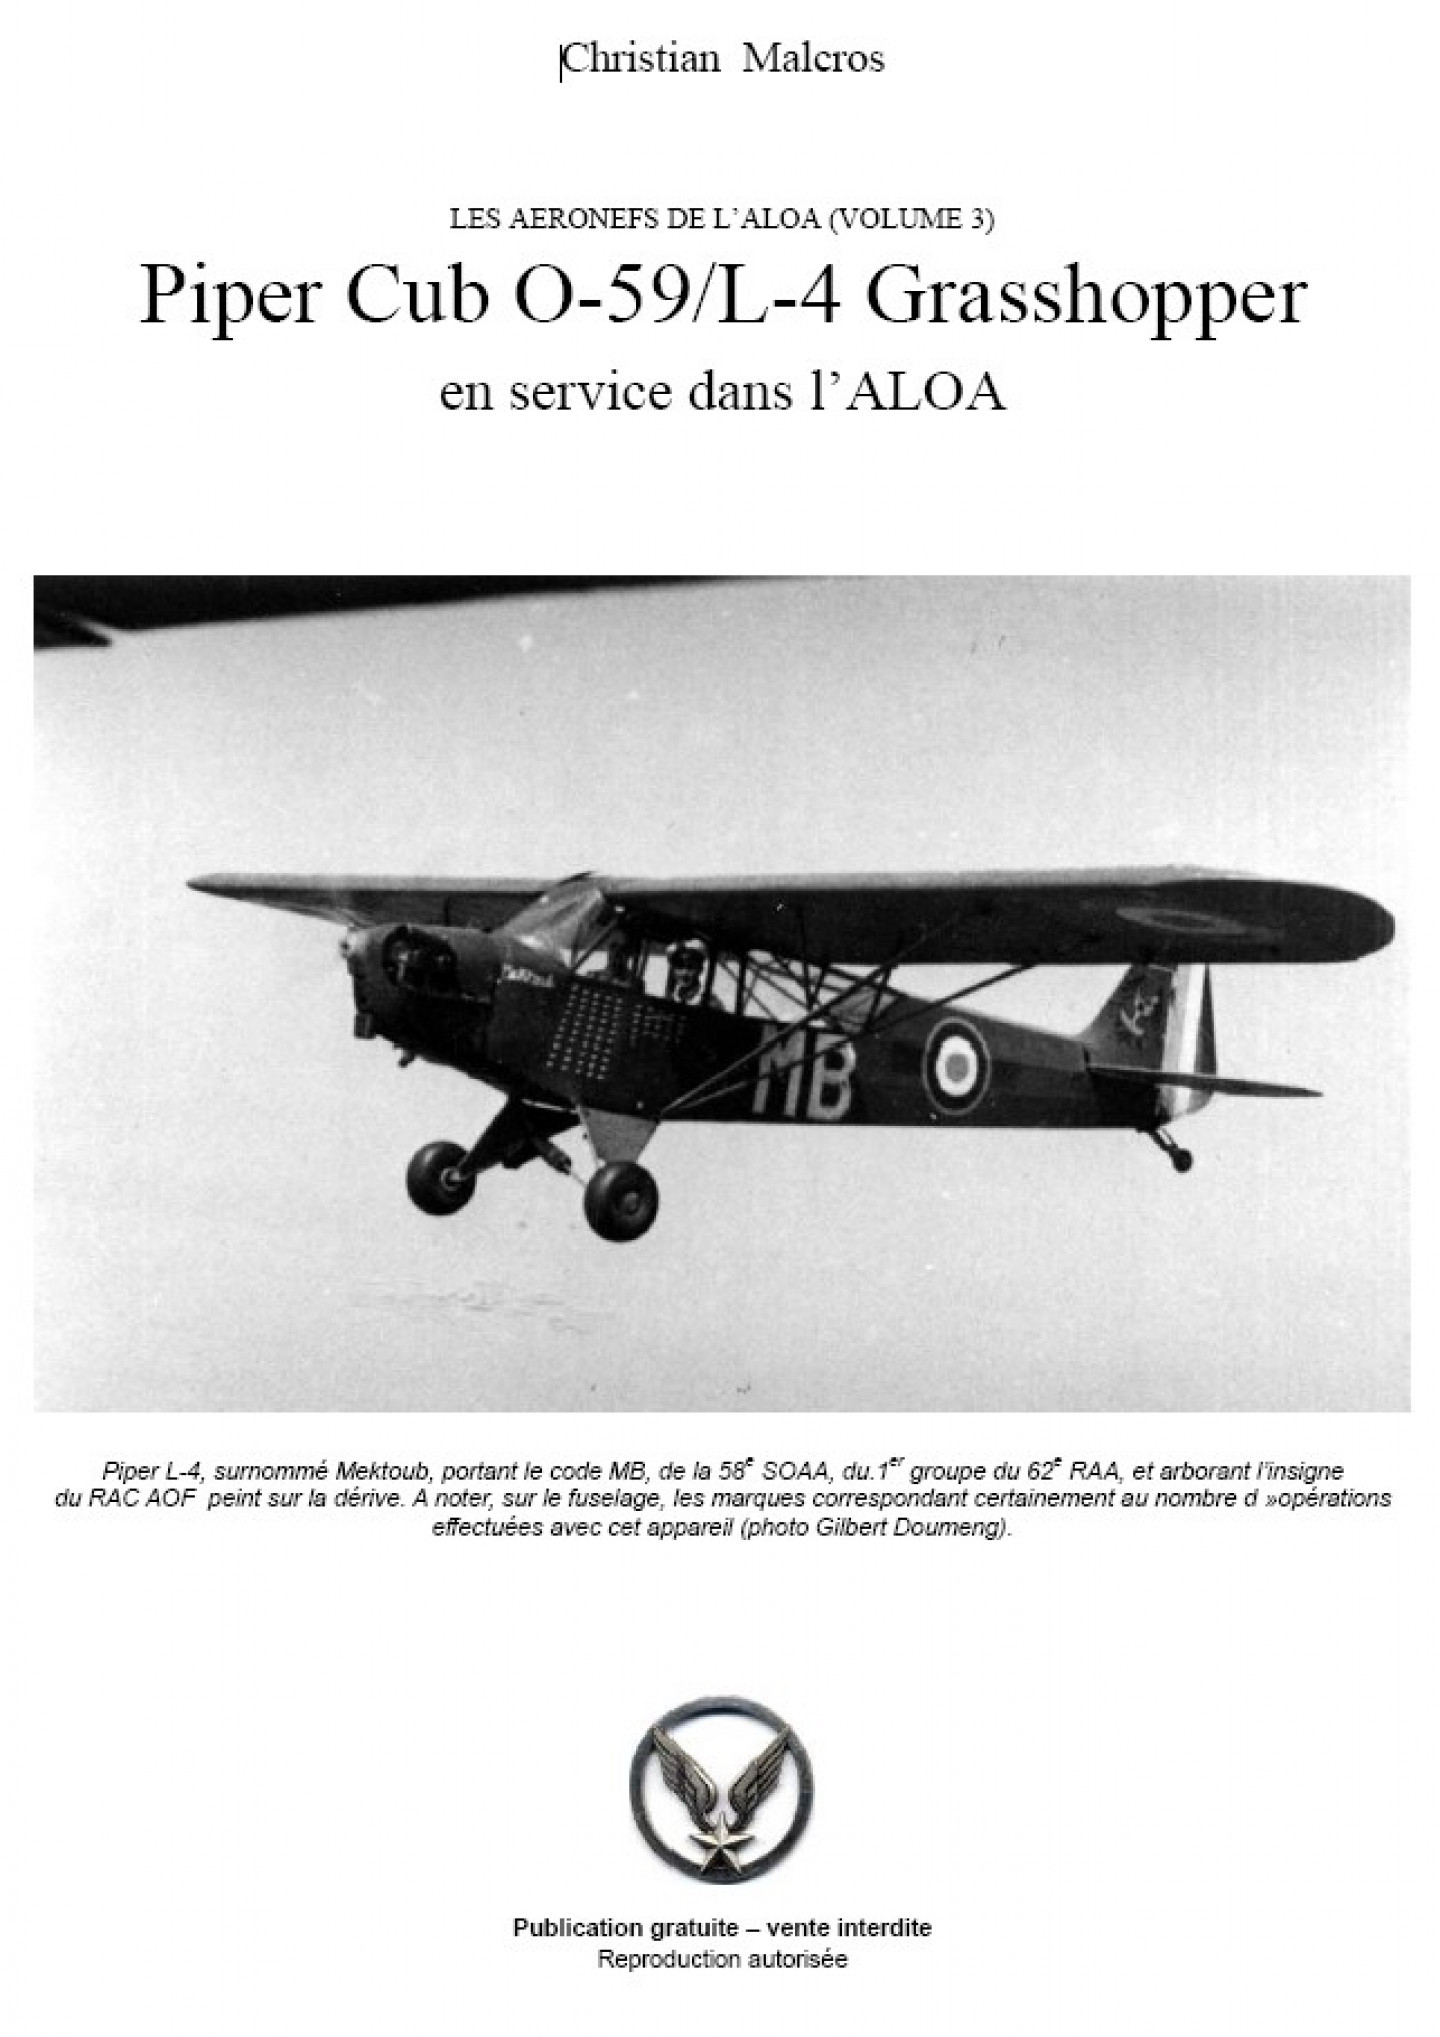 Les Aéronefs de l'ALOA (Volume 3) - Piper O-59 L-4 Grasshopper